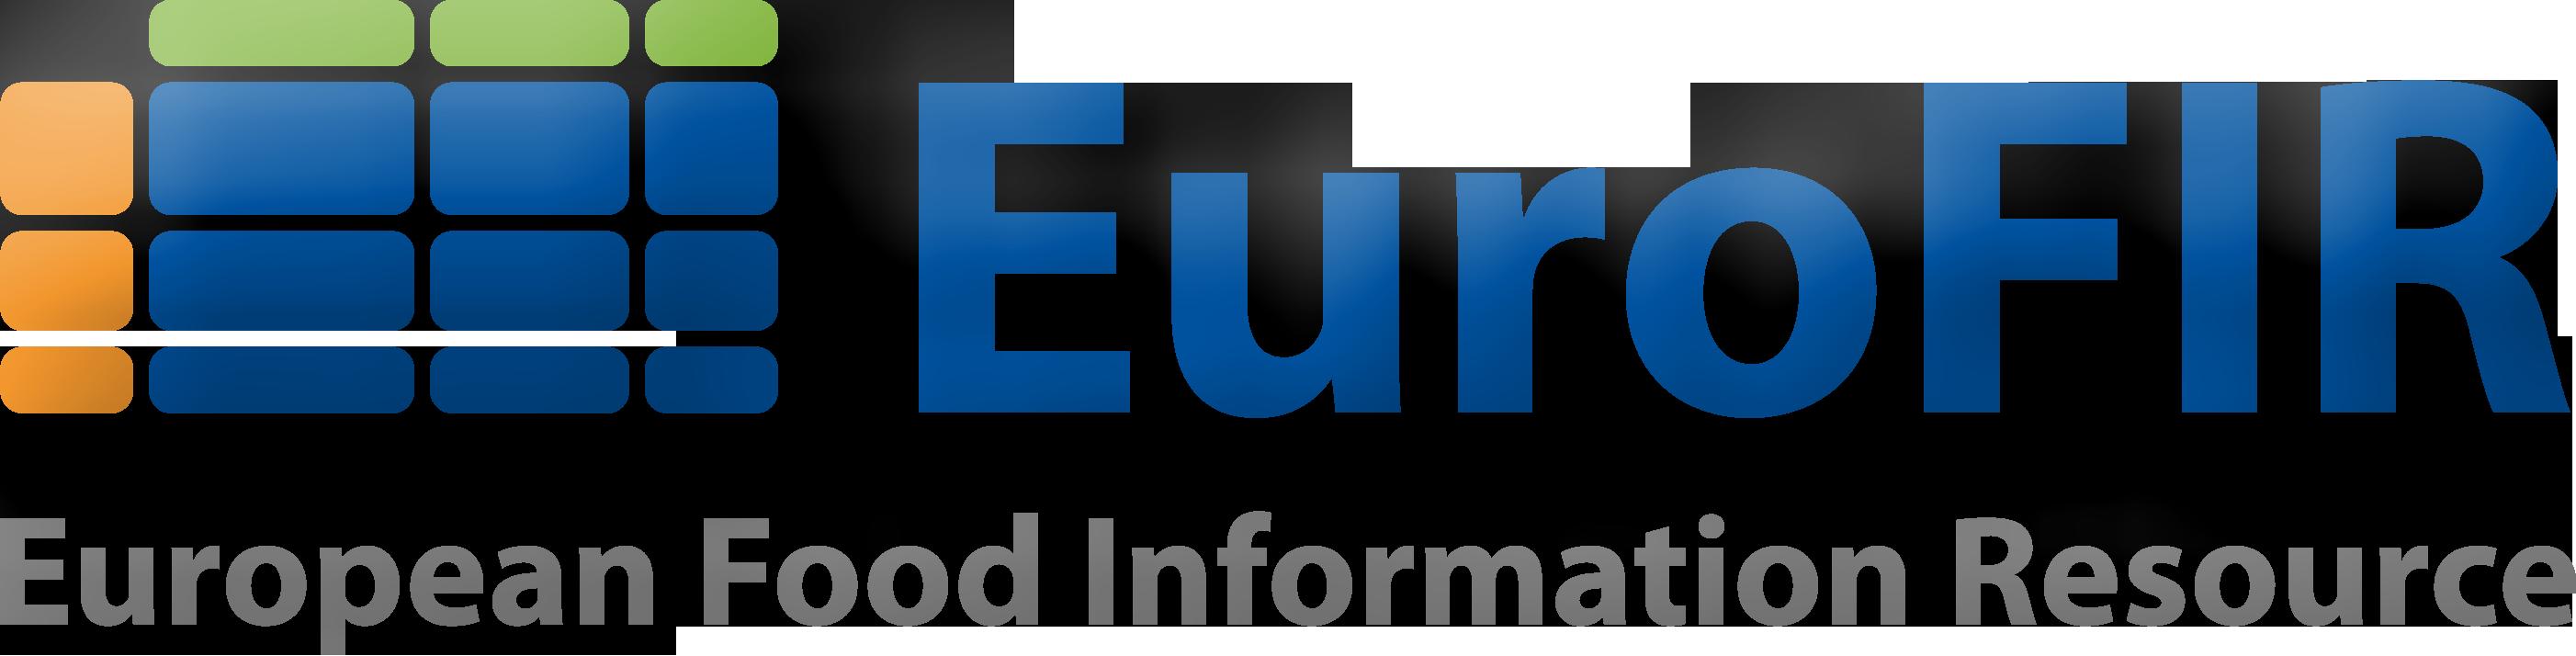 logo for European Food Information Resource